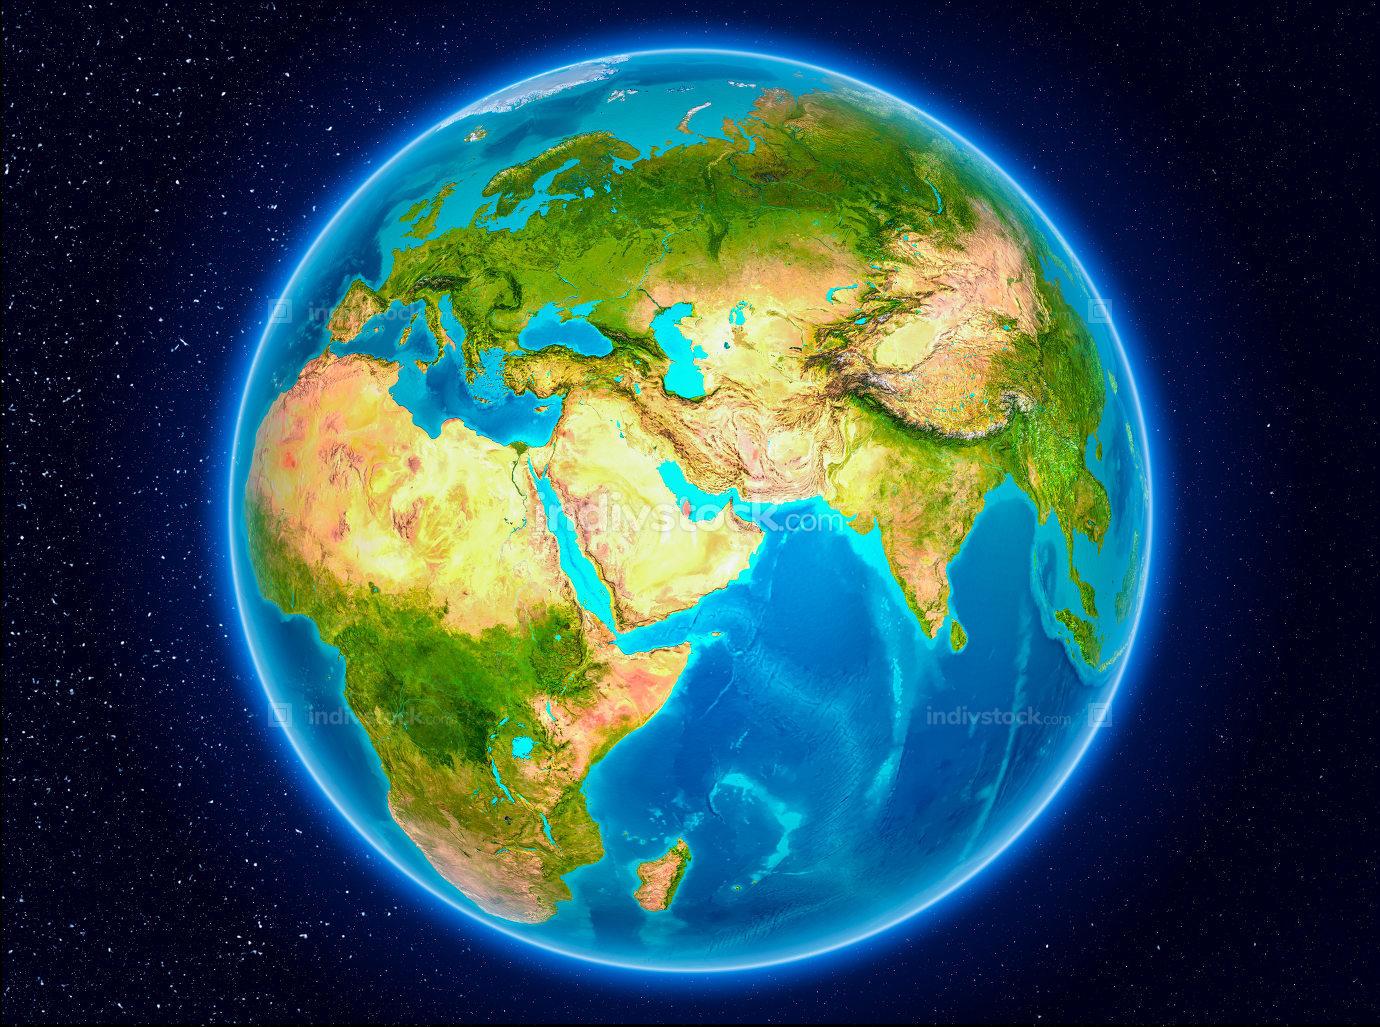 Qatar on Earth